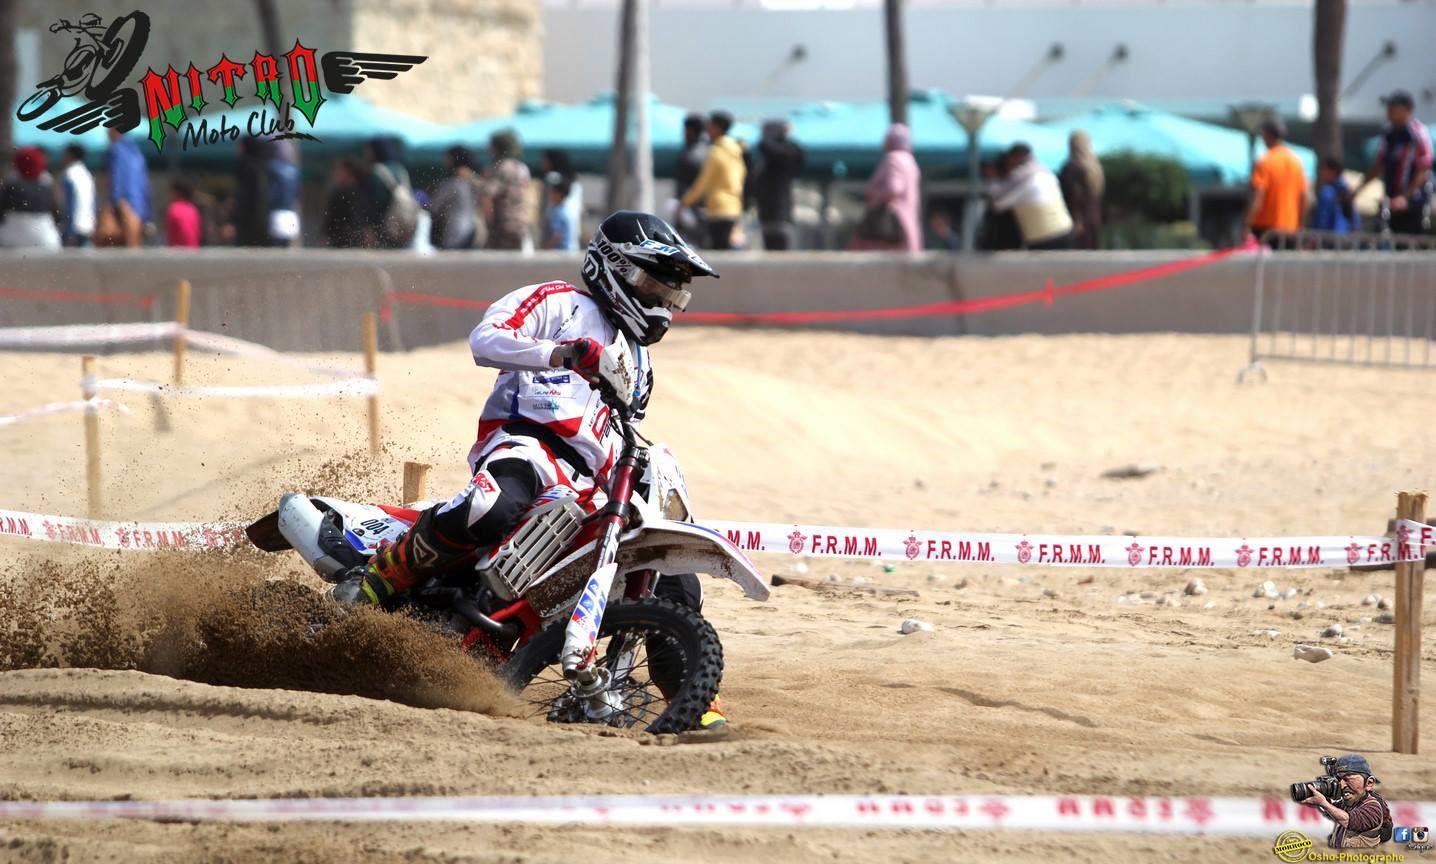 agadir-beach-race-la-reussite-791-4.jpg